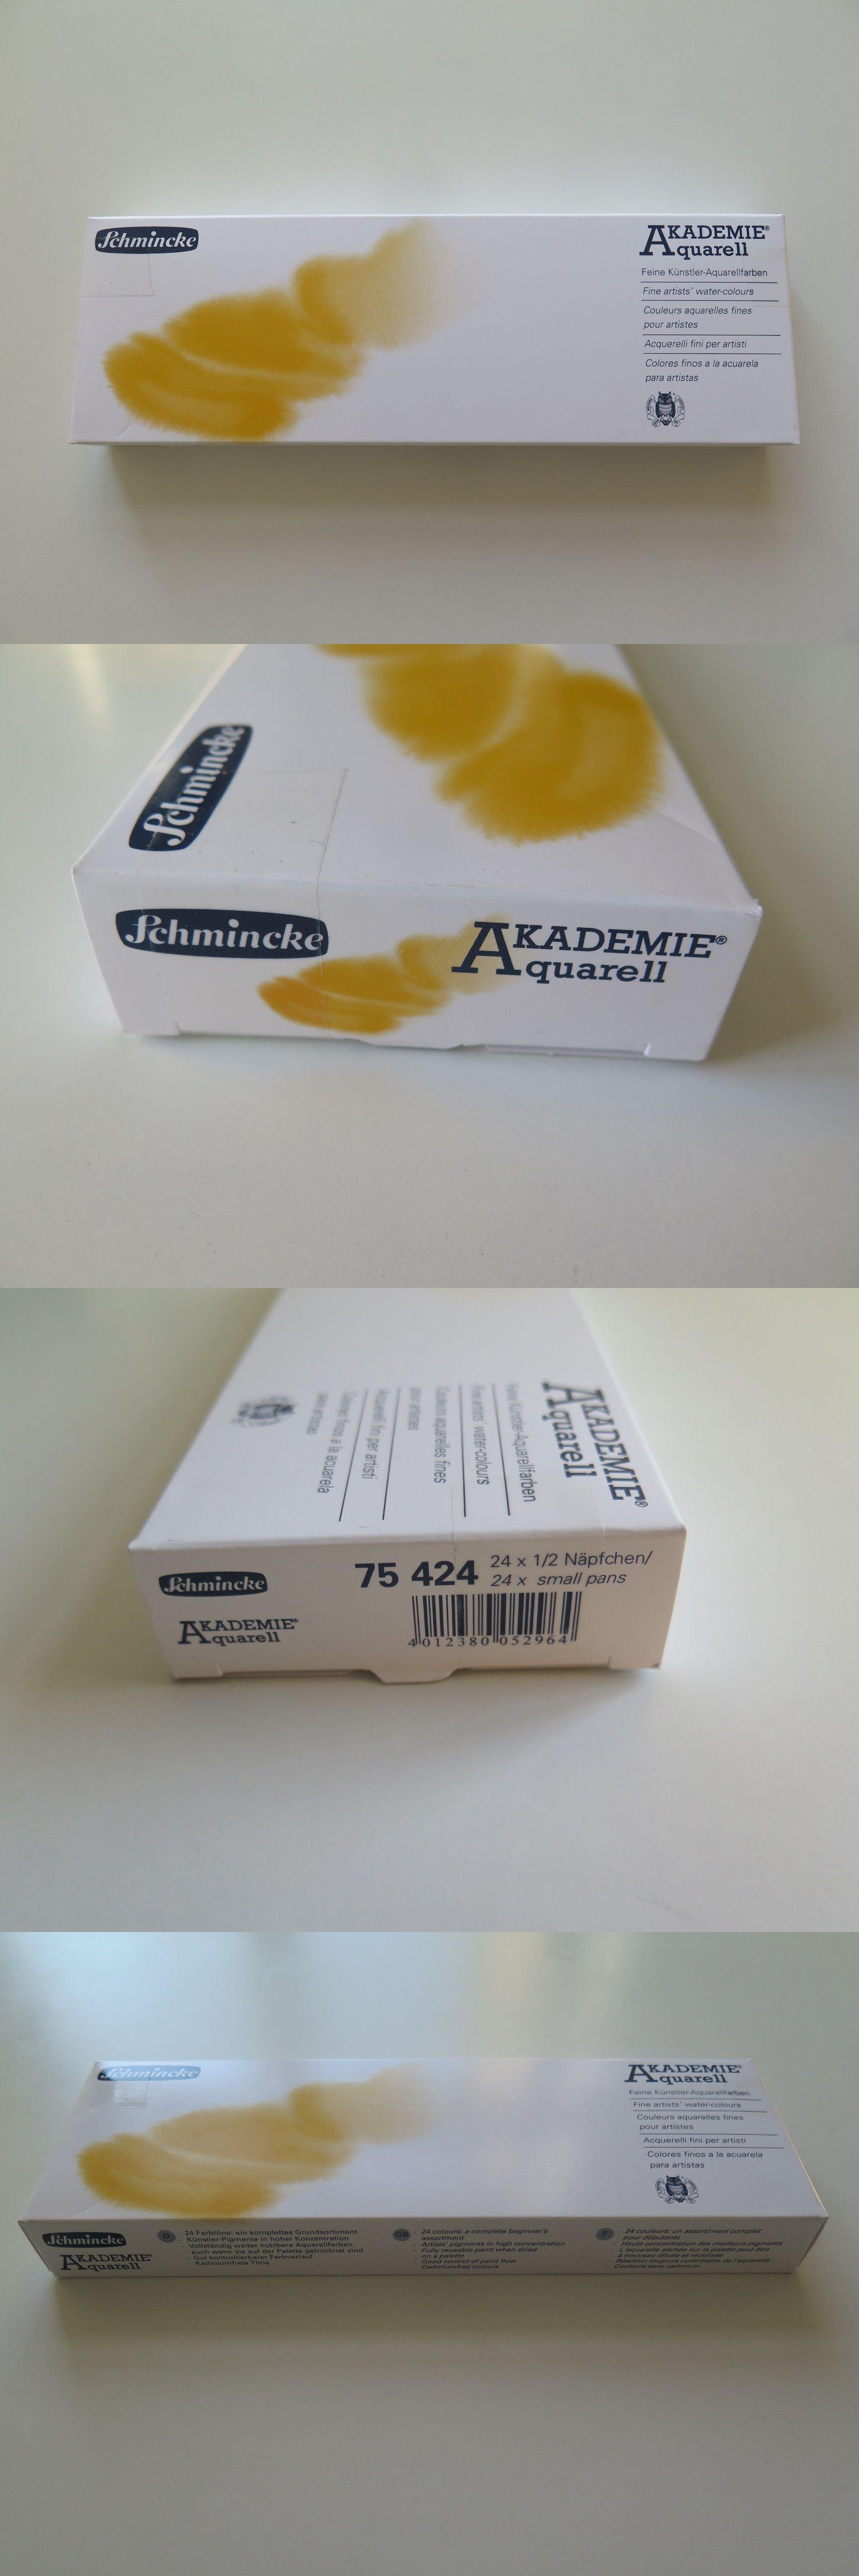 Schmincke Aquarellfarbe Akademie Aquarell Malkasten Metallkasten